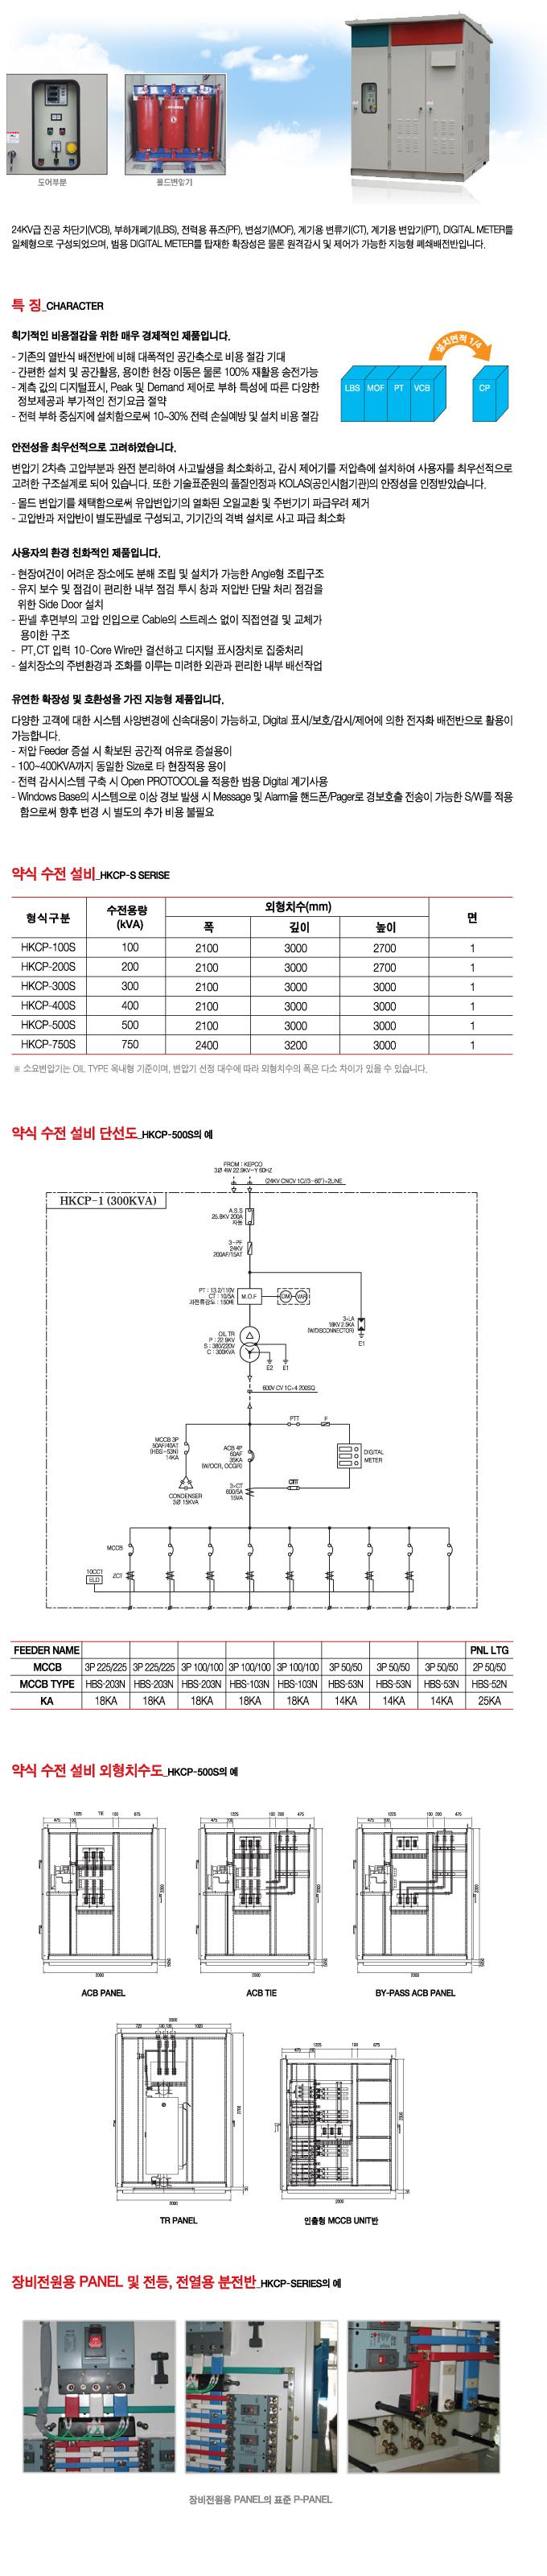 HANKWANG ELECTRICS Compact Panel HKCP-Series